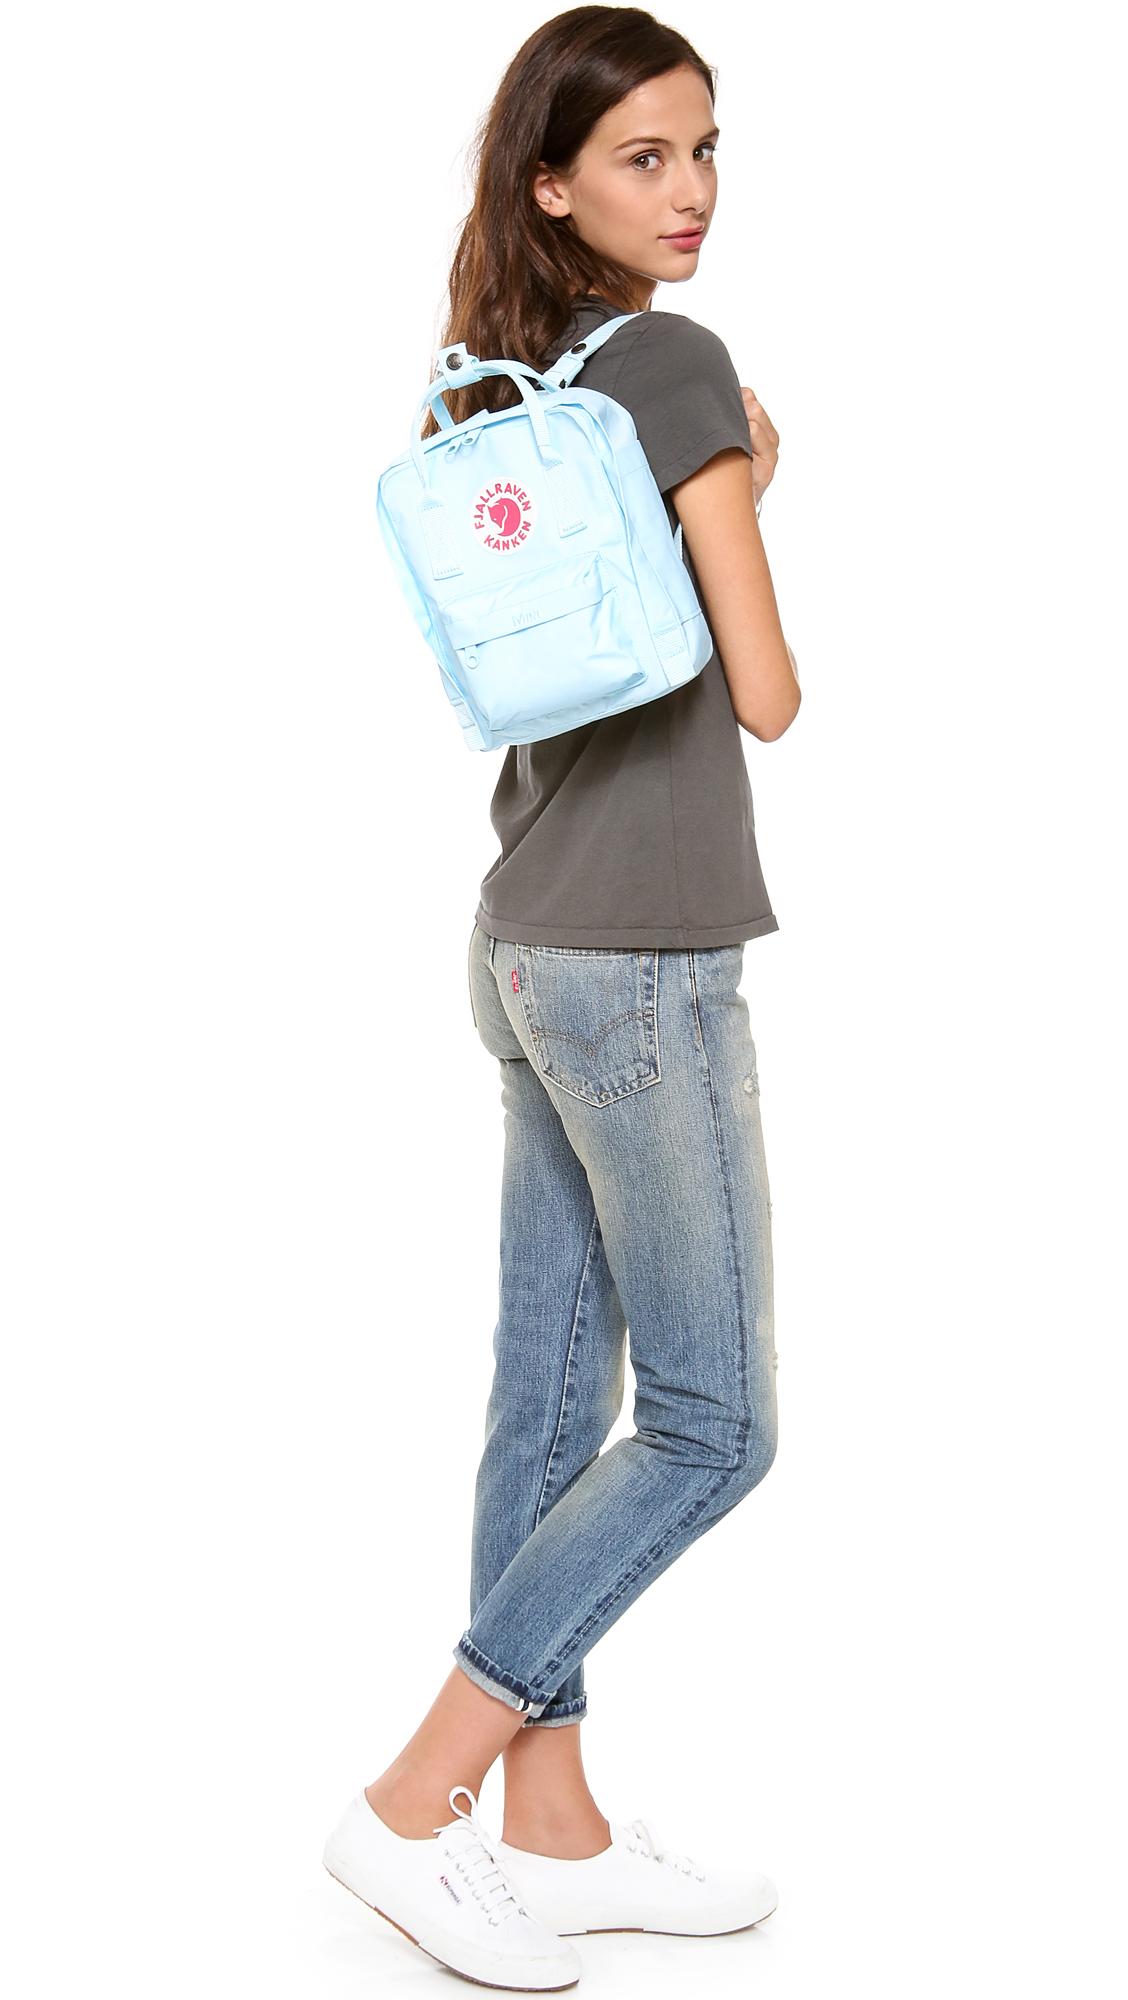 https://cdnc.lystit.com/photos/2013/09/11/fjallraven-light-blue-kanken-mini-backpack-product-4-13392612-587192816.jpeg